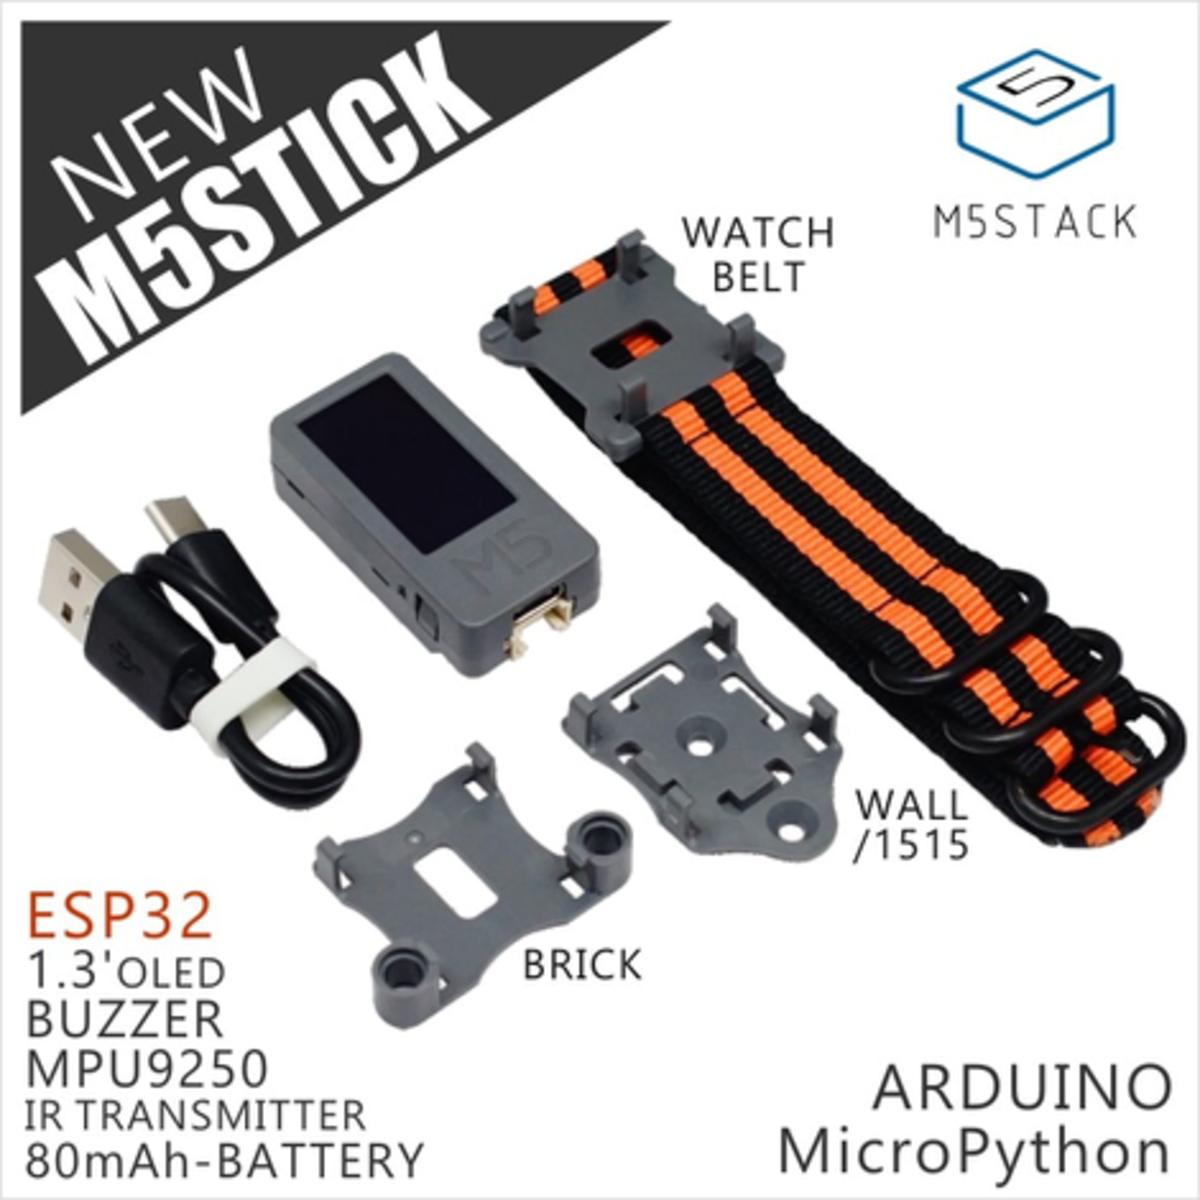 M5Stick